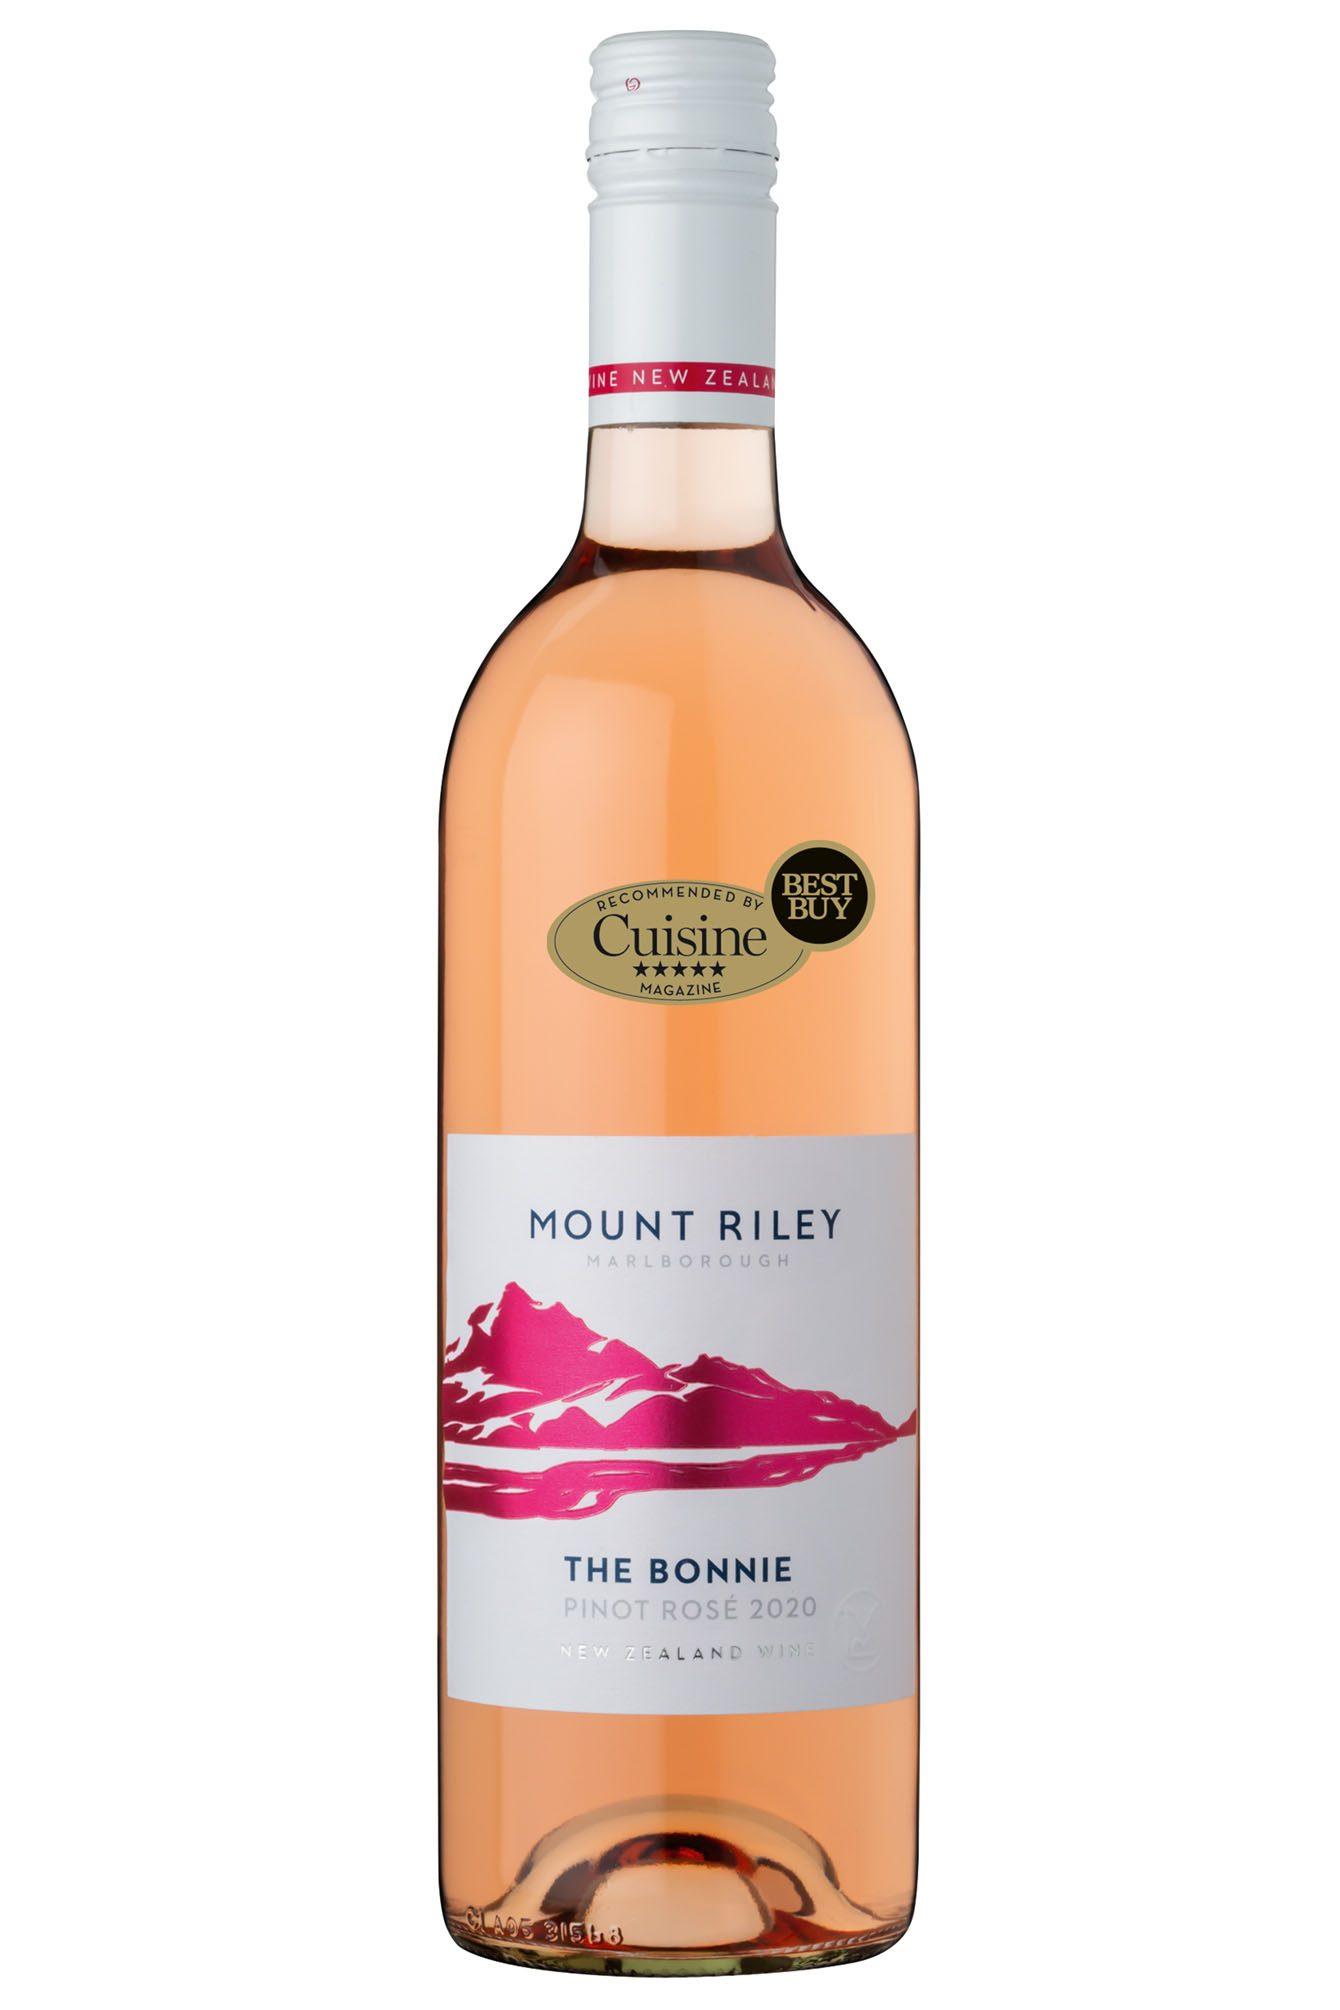 Mount Riley 'The Bonnie' Pinot Rosé 2020 (Marlborough)